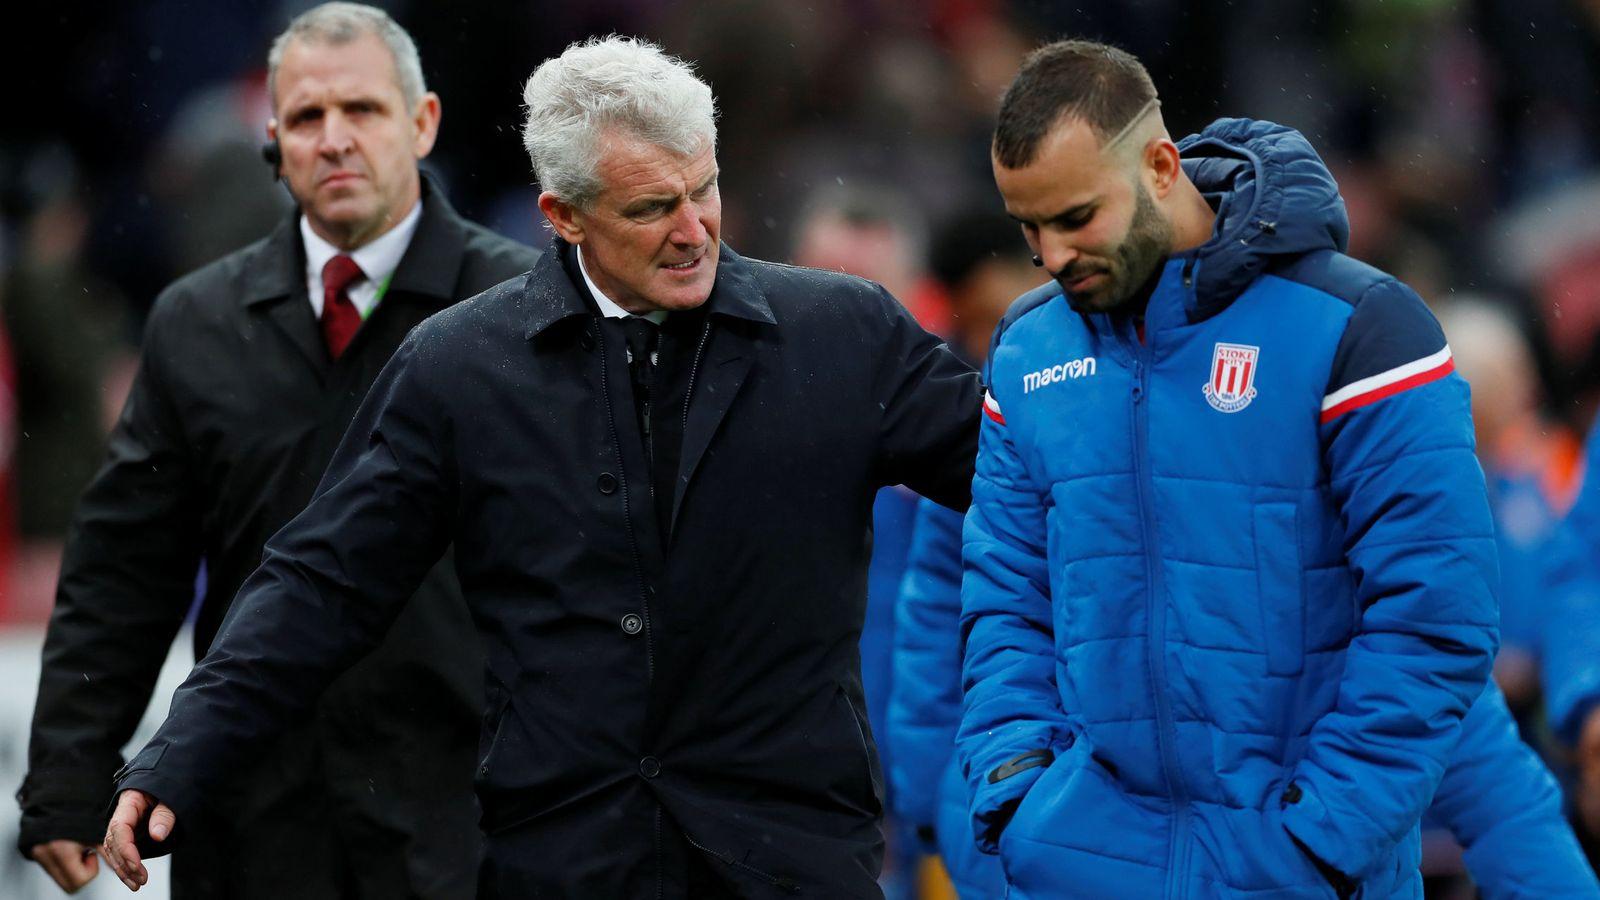 Foto: Jesé, cabizbajo, junto al mánager del Stoke City, Mark Hughes. (Reuters)